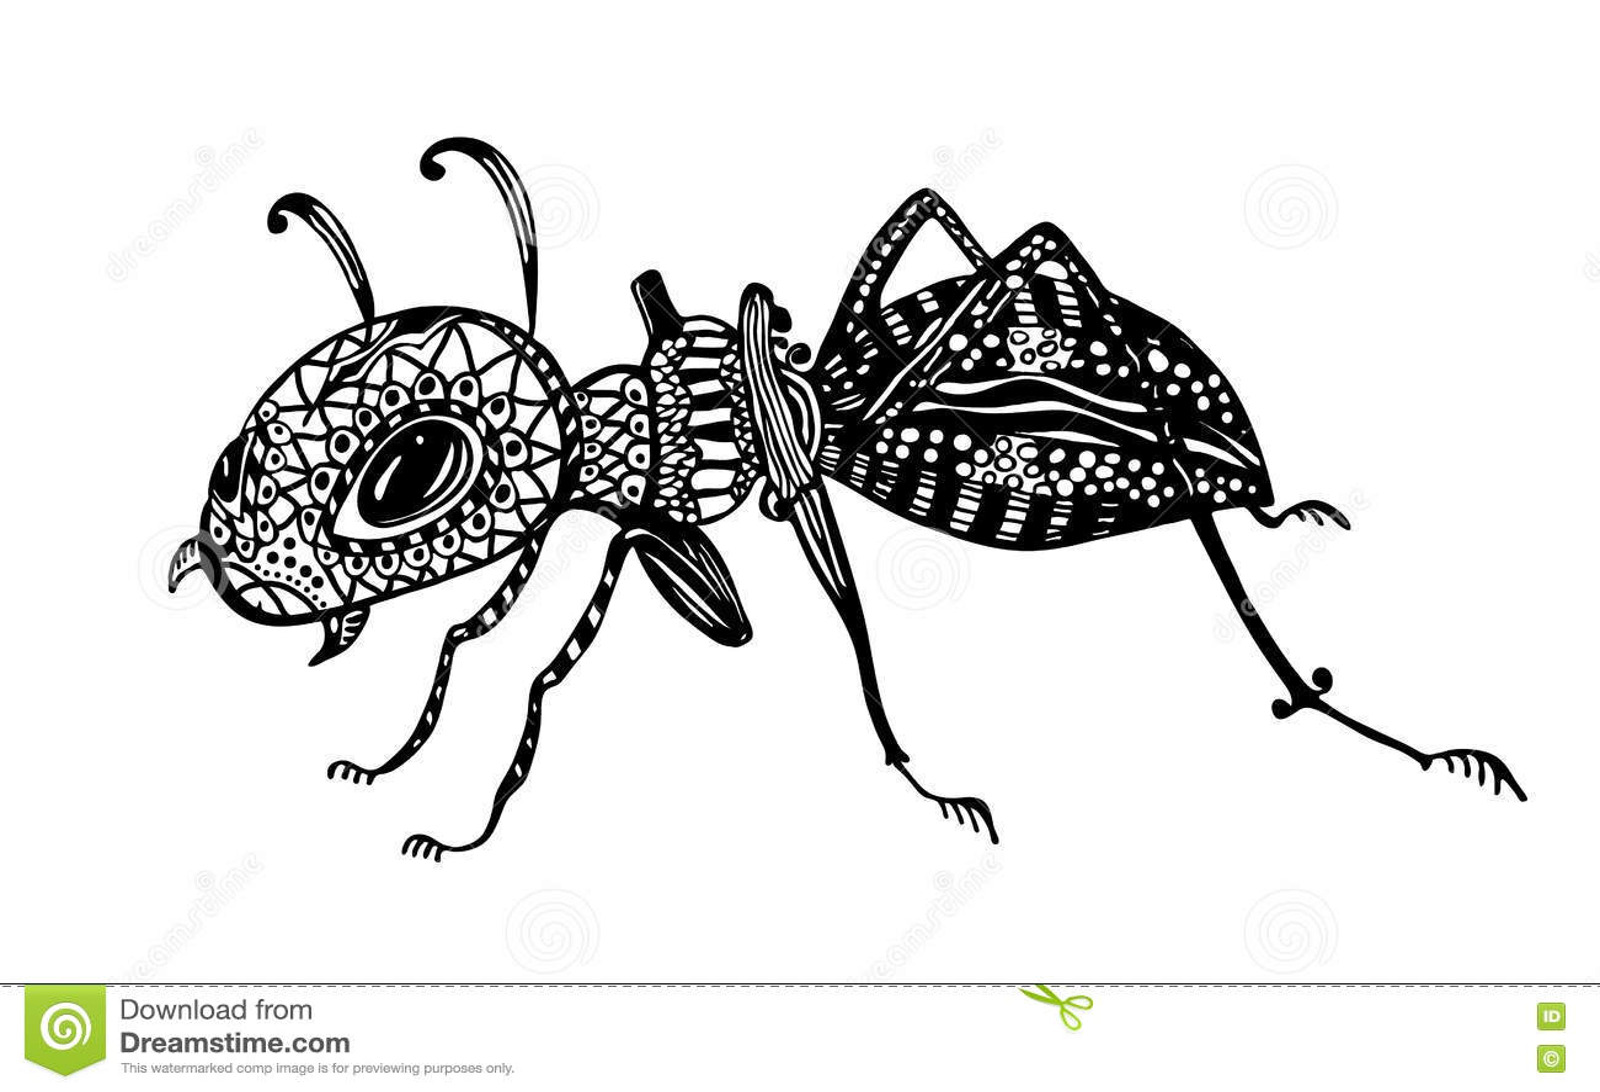 vector illustration ant line art doodle art coloring